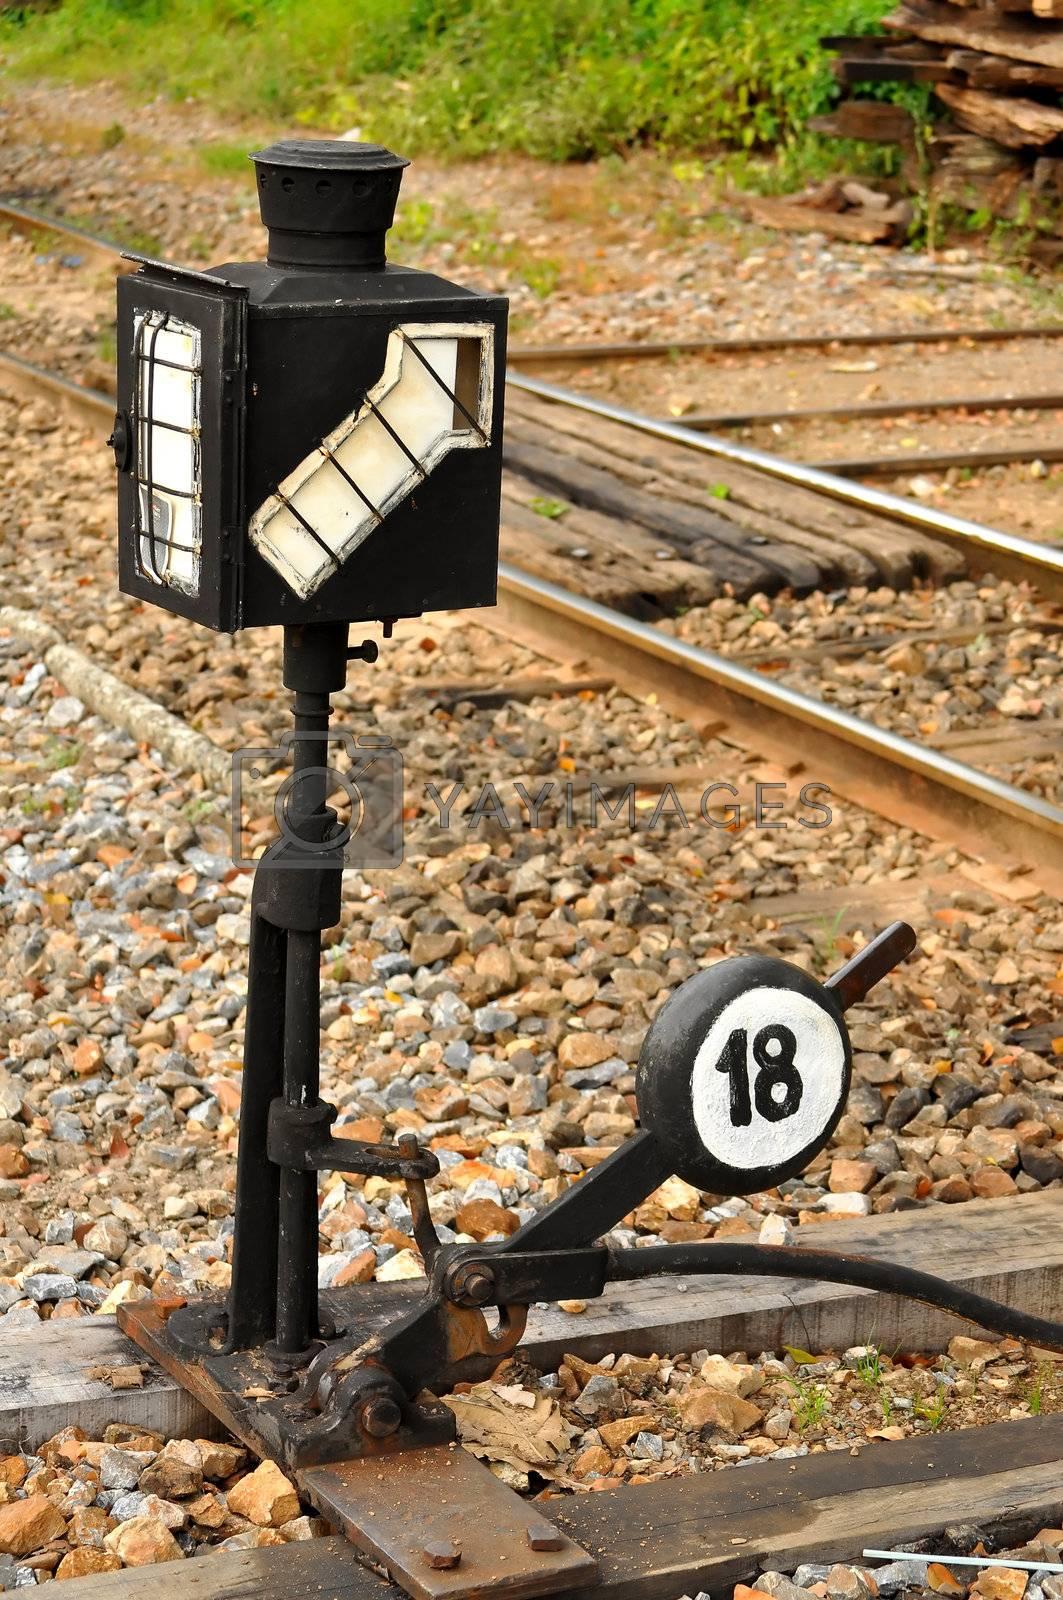 signal on railroad at railway station